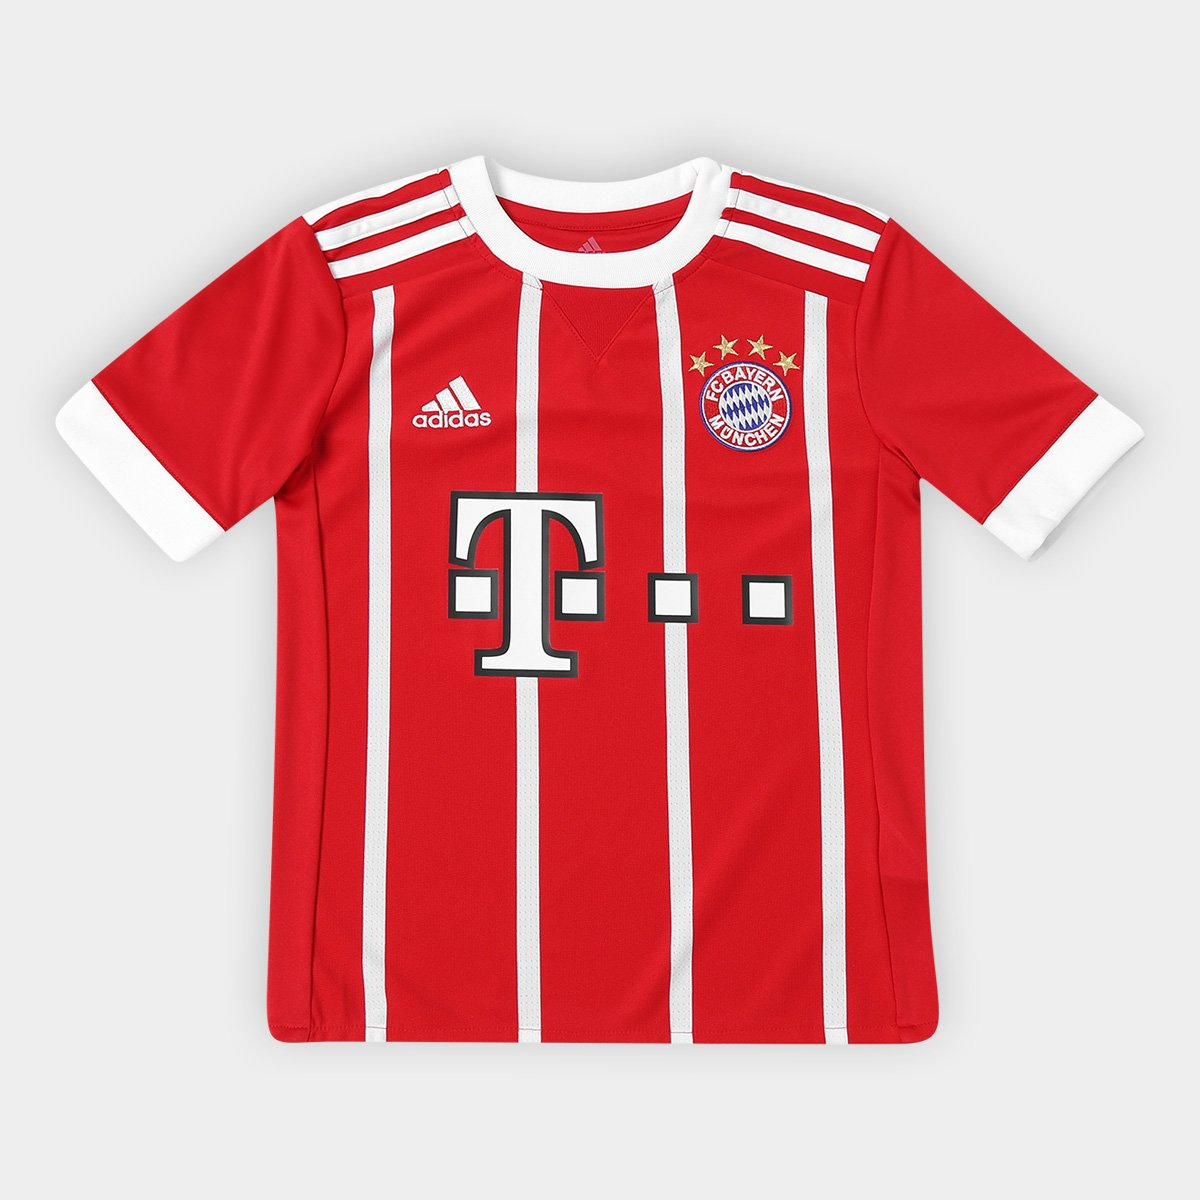 88ff73253 Camisa Bayern de Munique Infantil Home 17 18 s nº - Torcedor Adidas